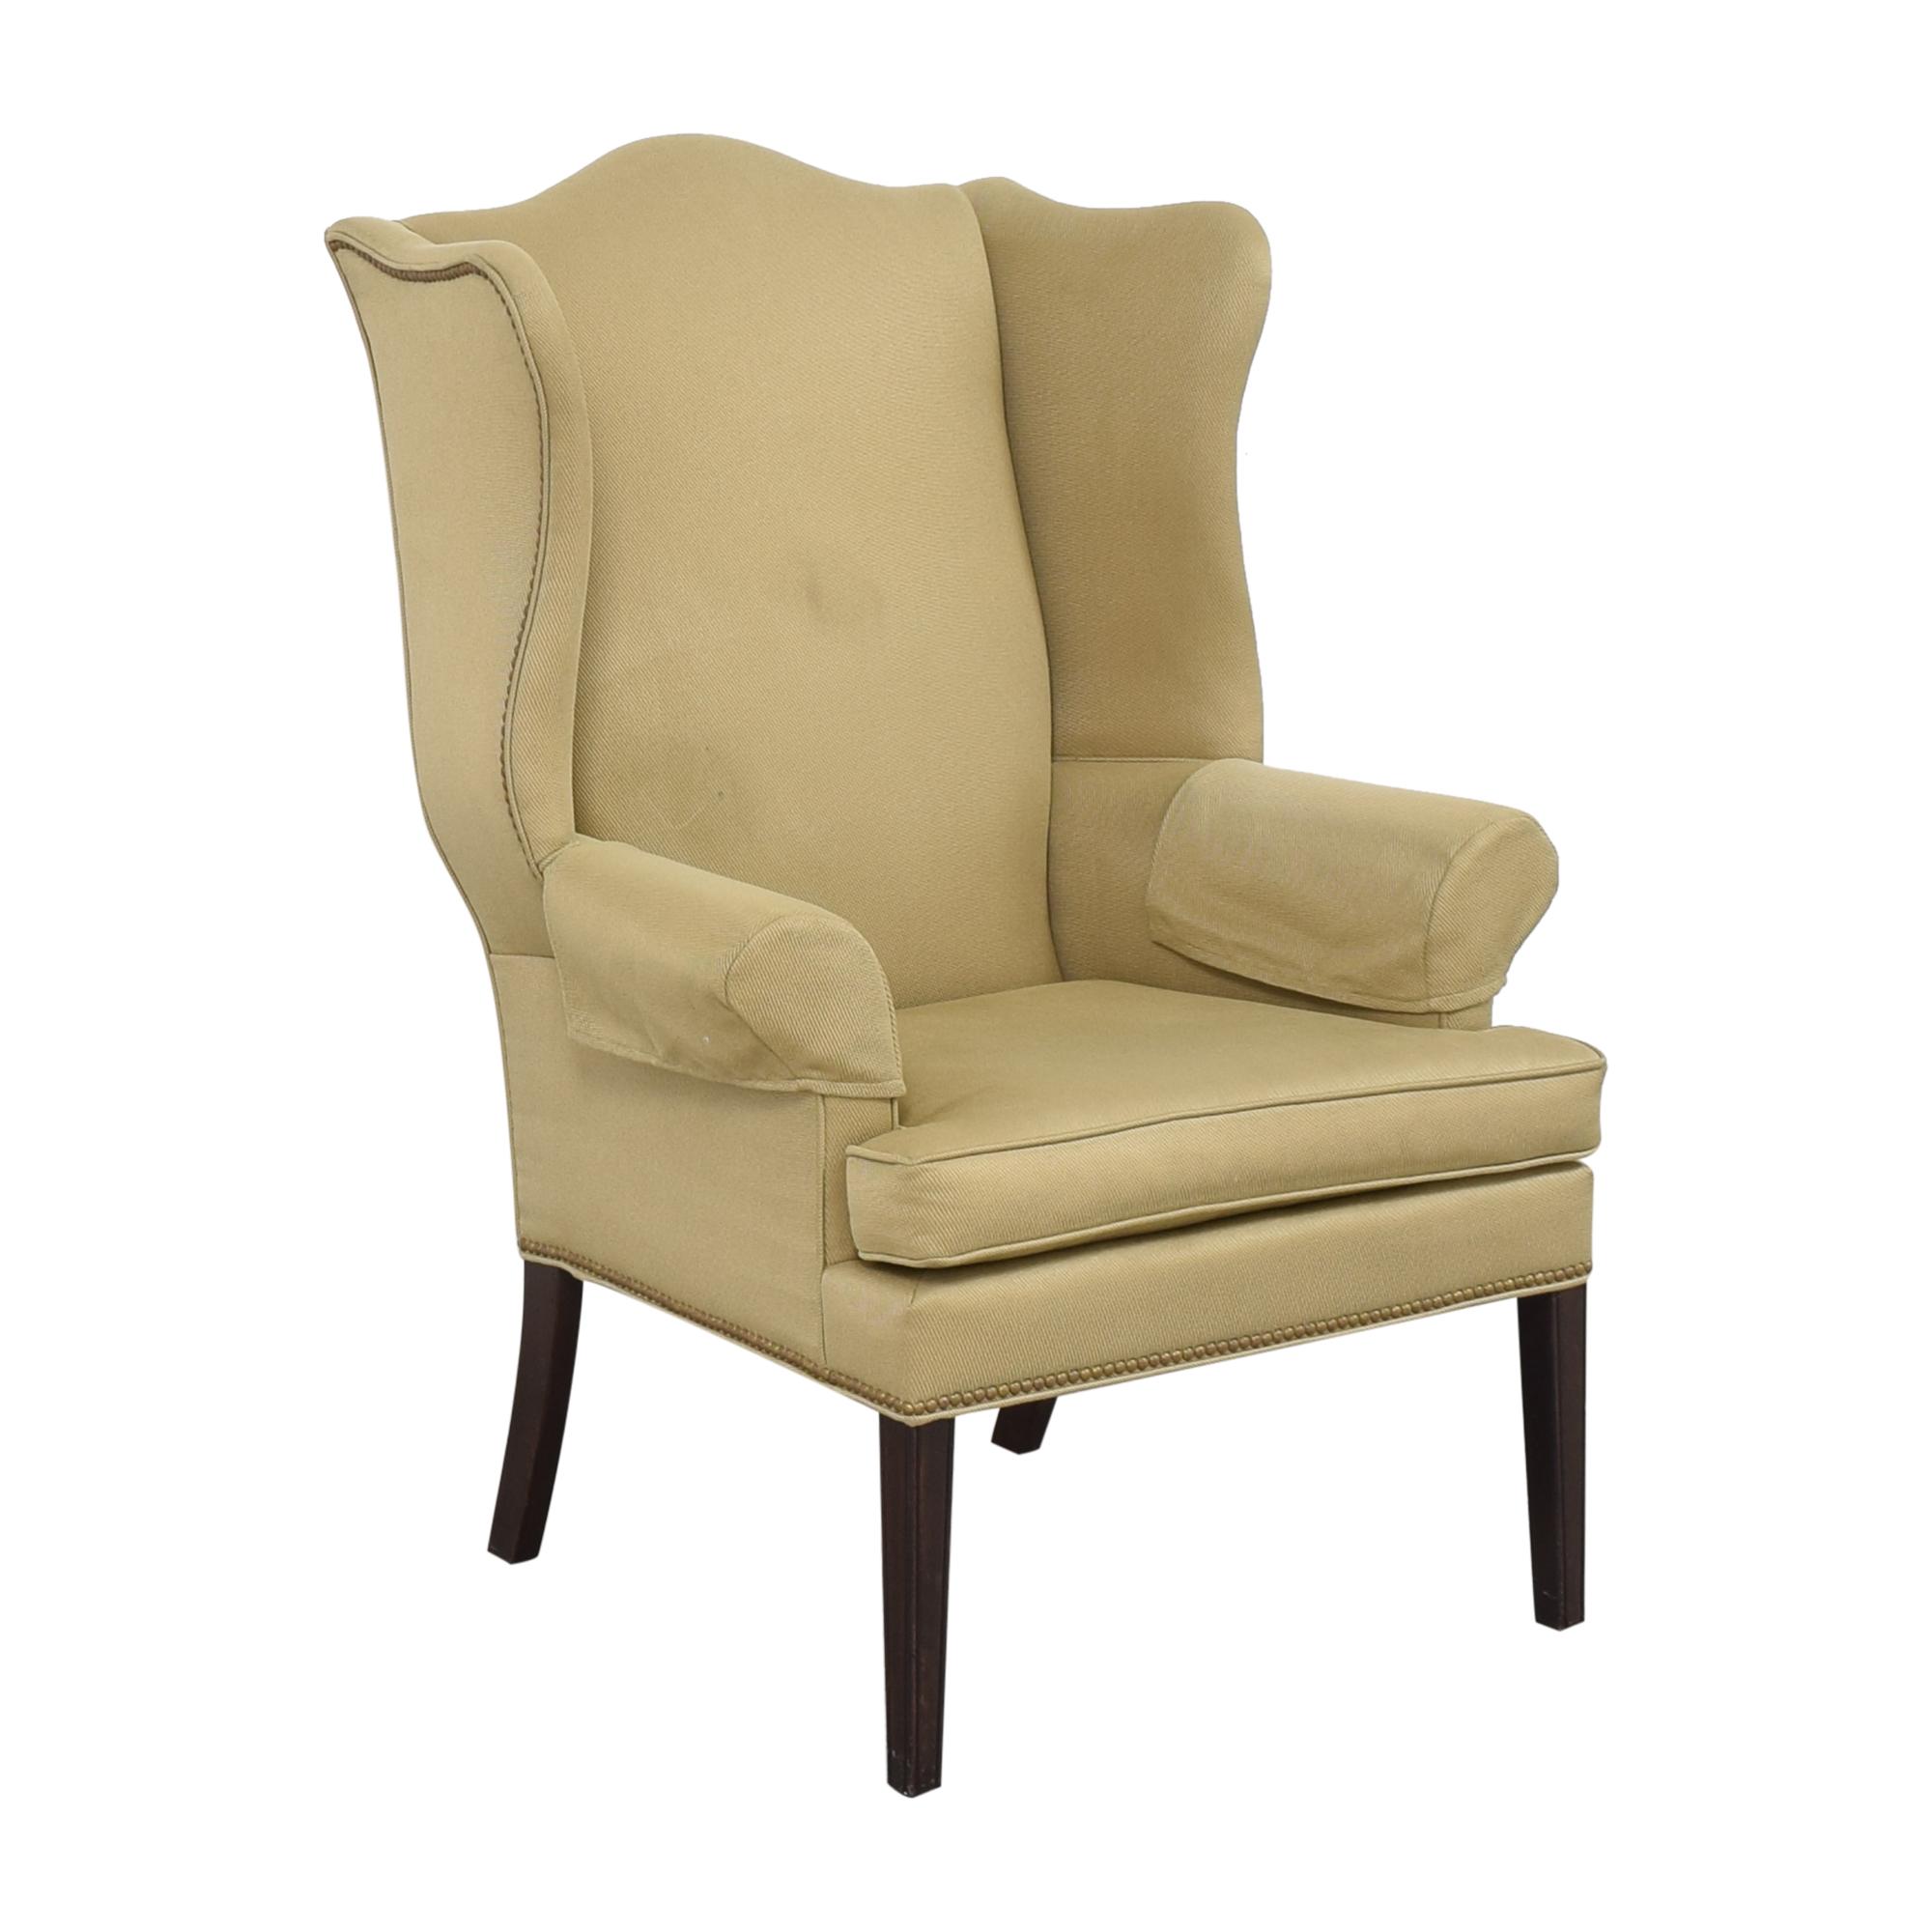 Ethan Allen Ethan Allen Wing Back Chair nj